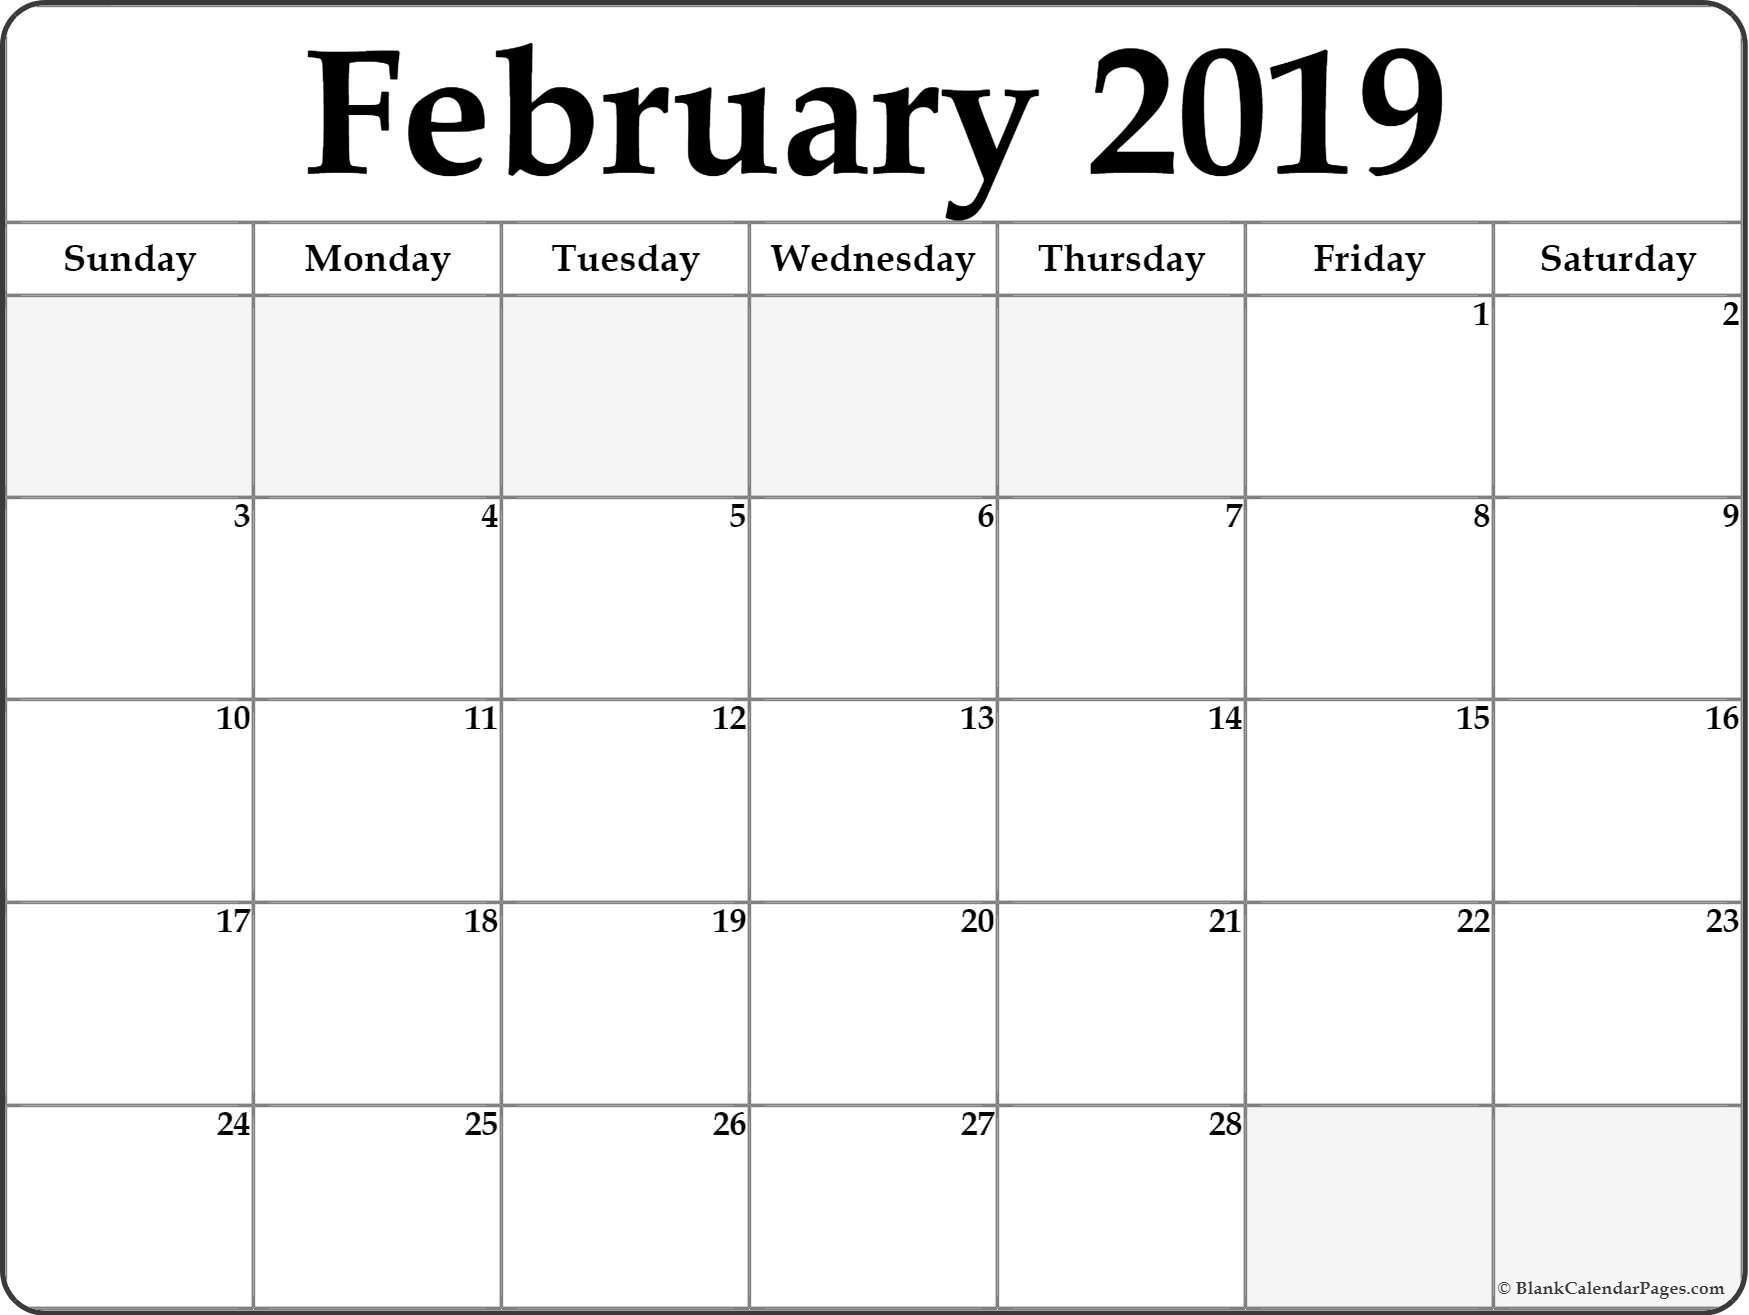 February Calendar Editable 2019 | 250+ Free Monthly Calendar 2019 Calendar You Can Edit